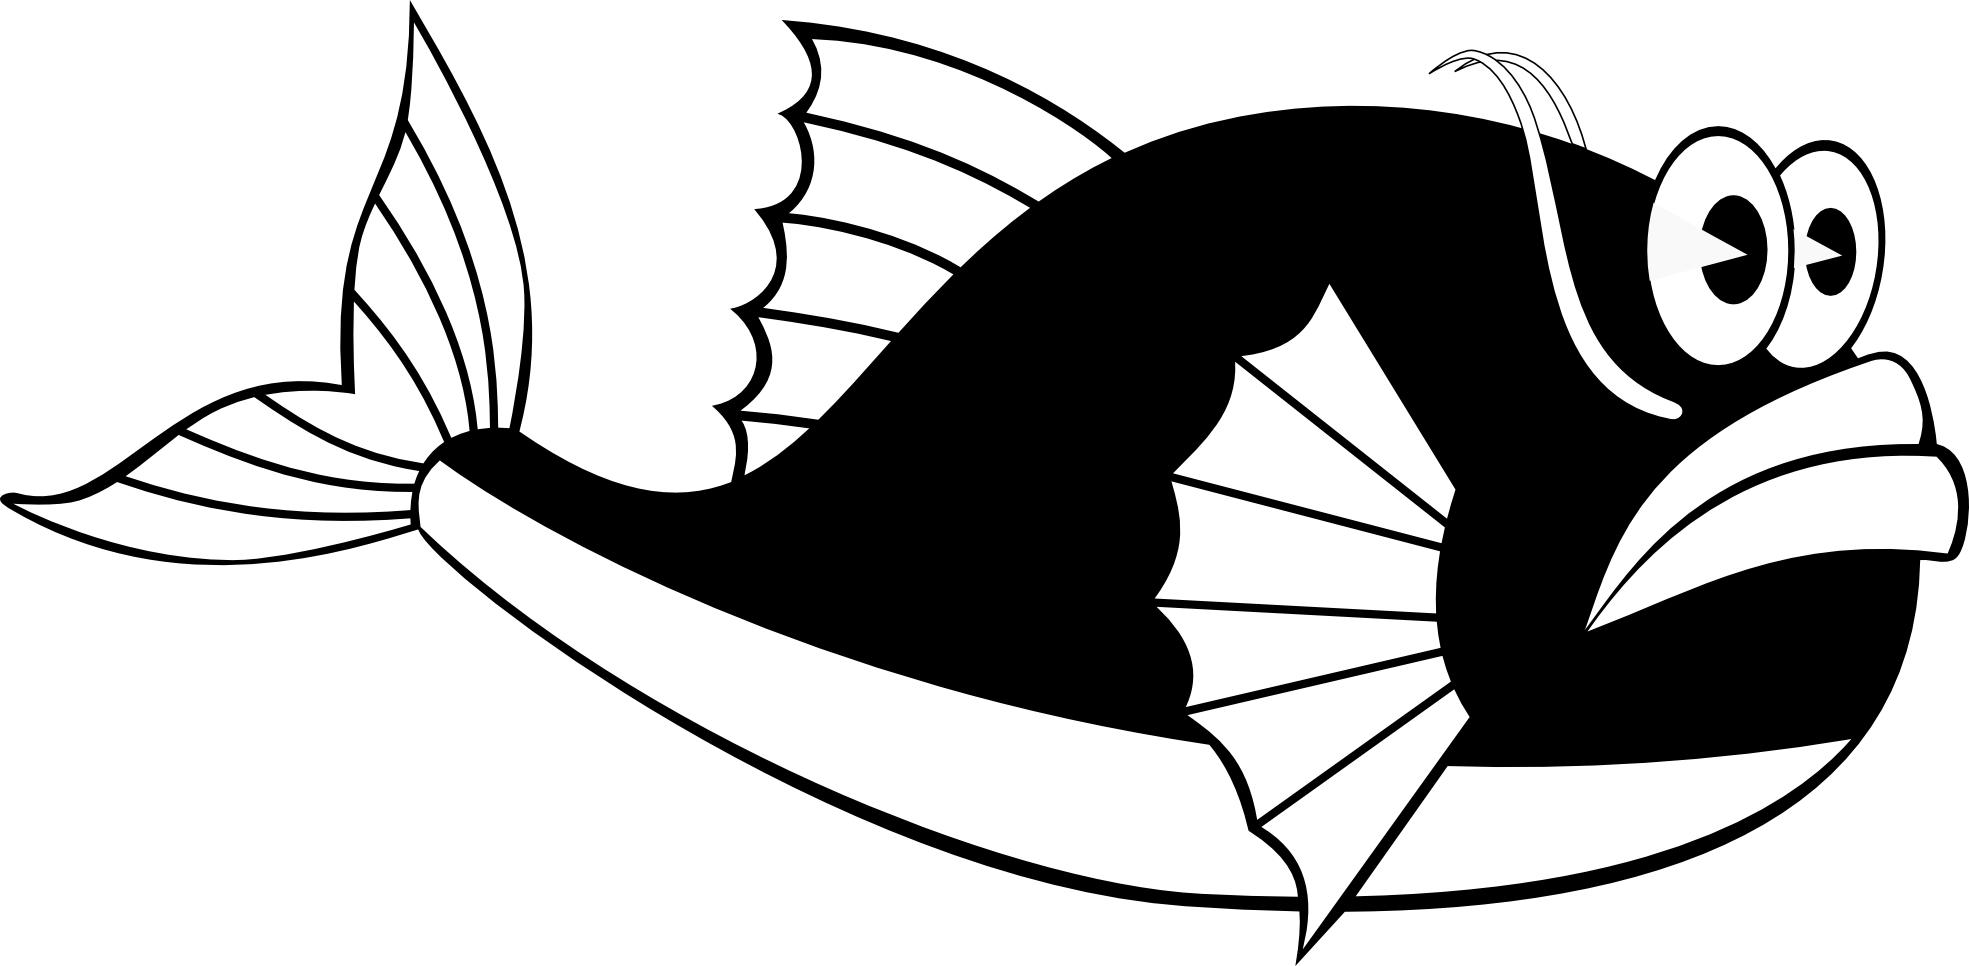 Whale Clip Art Black And White Clipart Panda